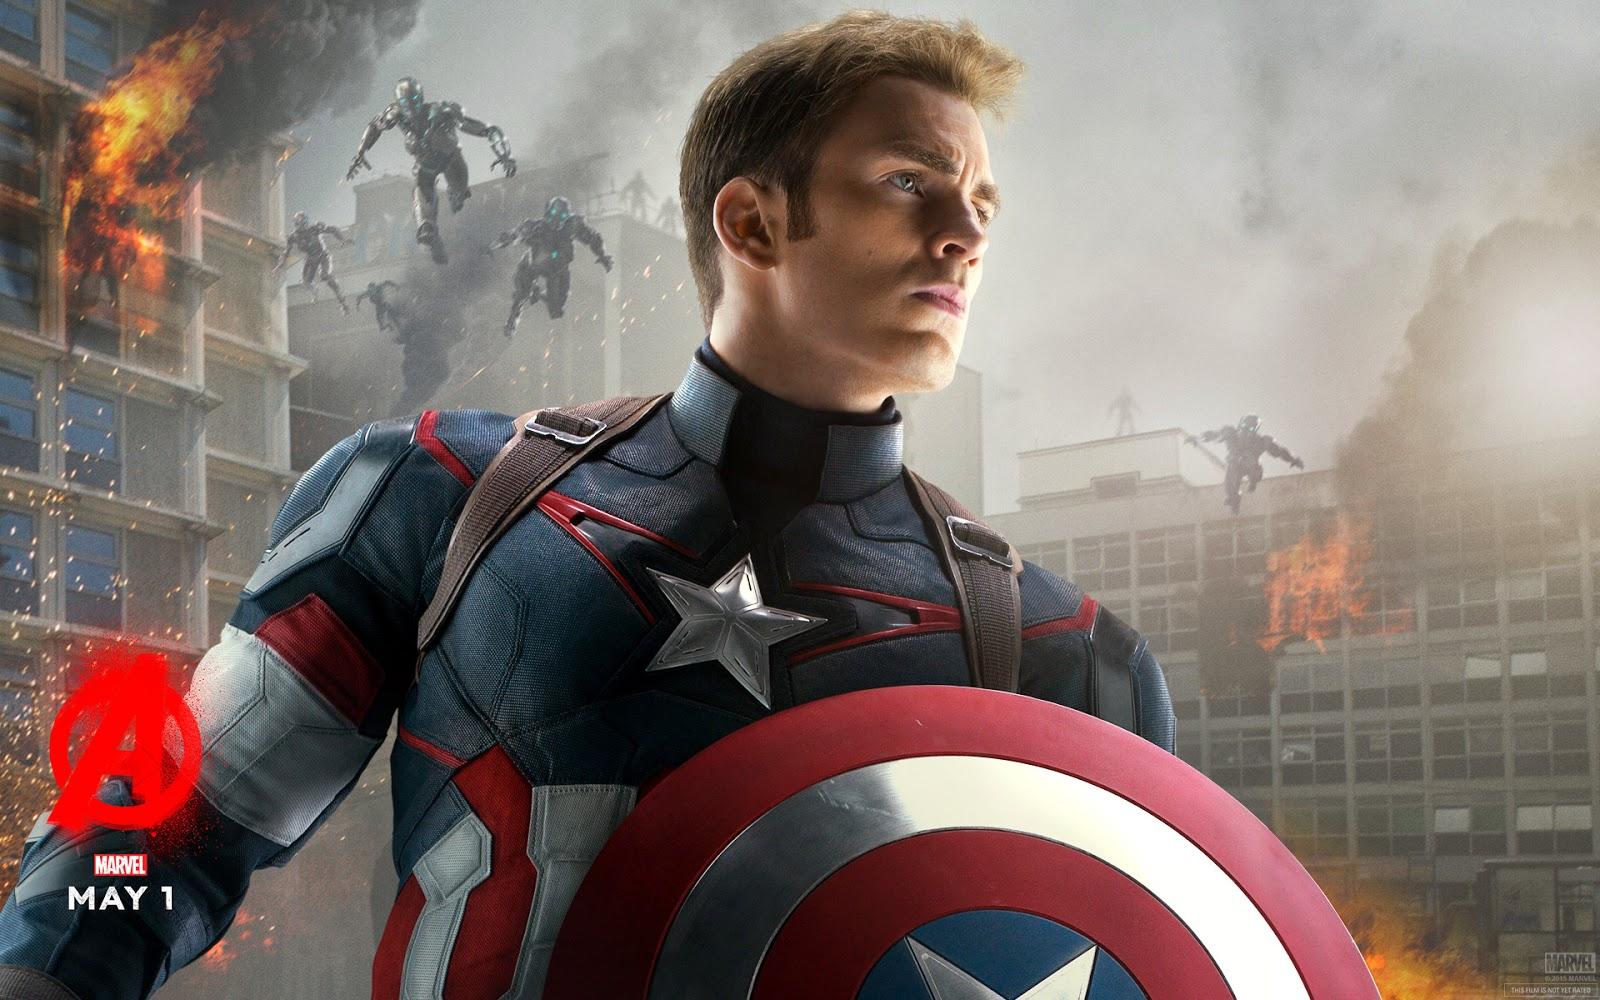 Amazing Wallpaper Marvel Avengers Age Ultron - Captain%2BAmerica%2BAvengers%2BAge%2Bof%2BUltron%2B2015%2BWallpaper  You Should Have_85665.jpg